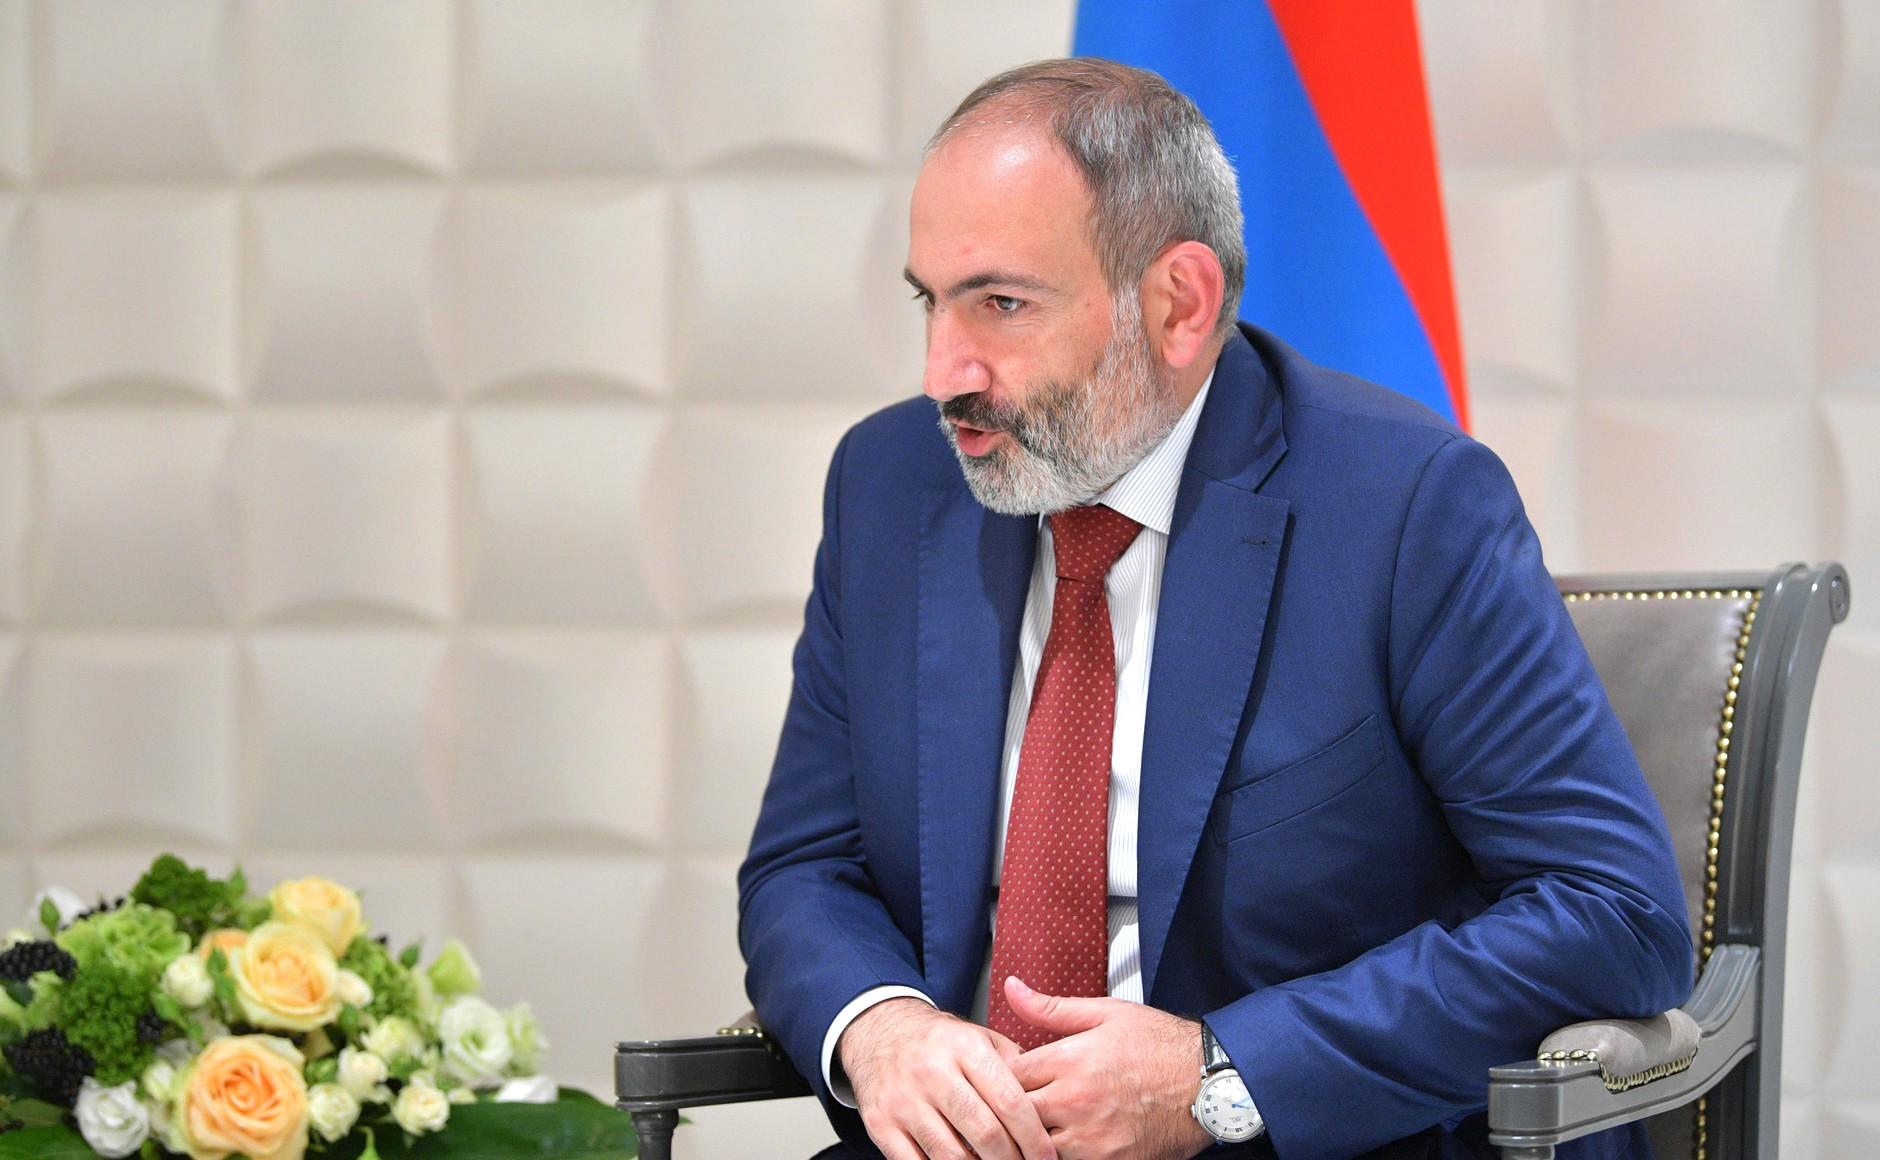 Пашинян написал письмо Путину о помощи Армении